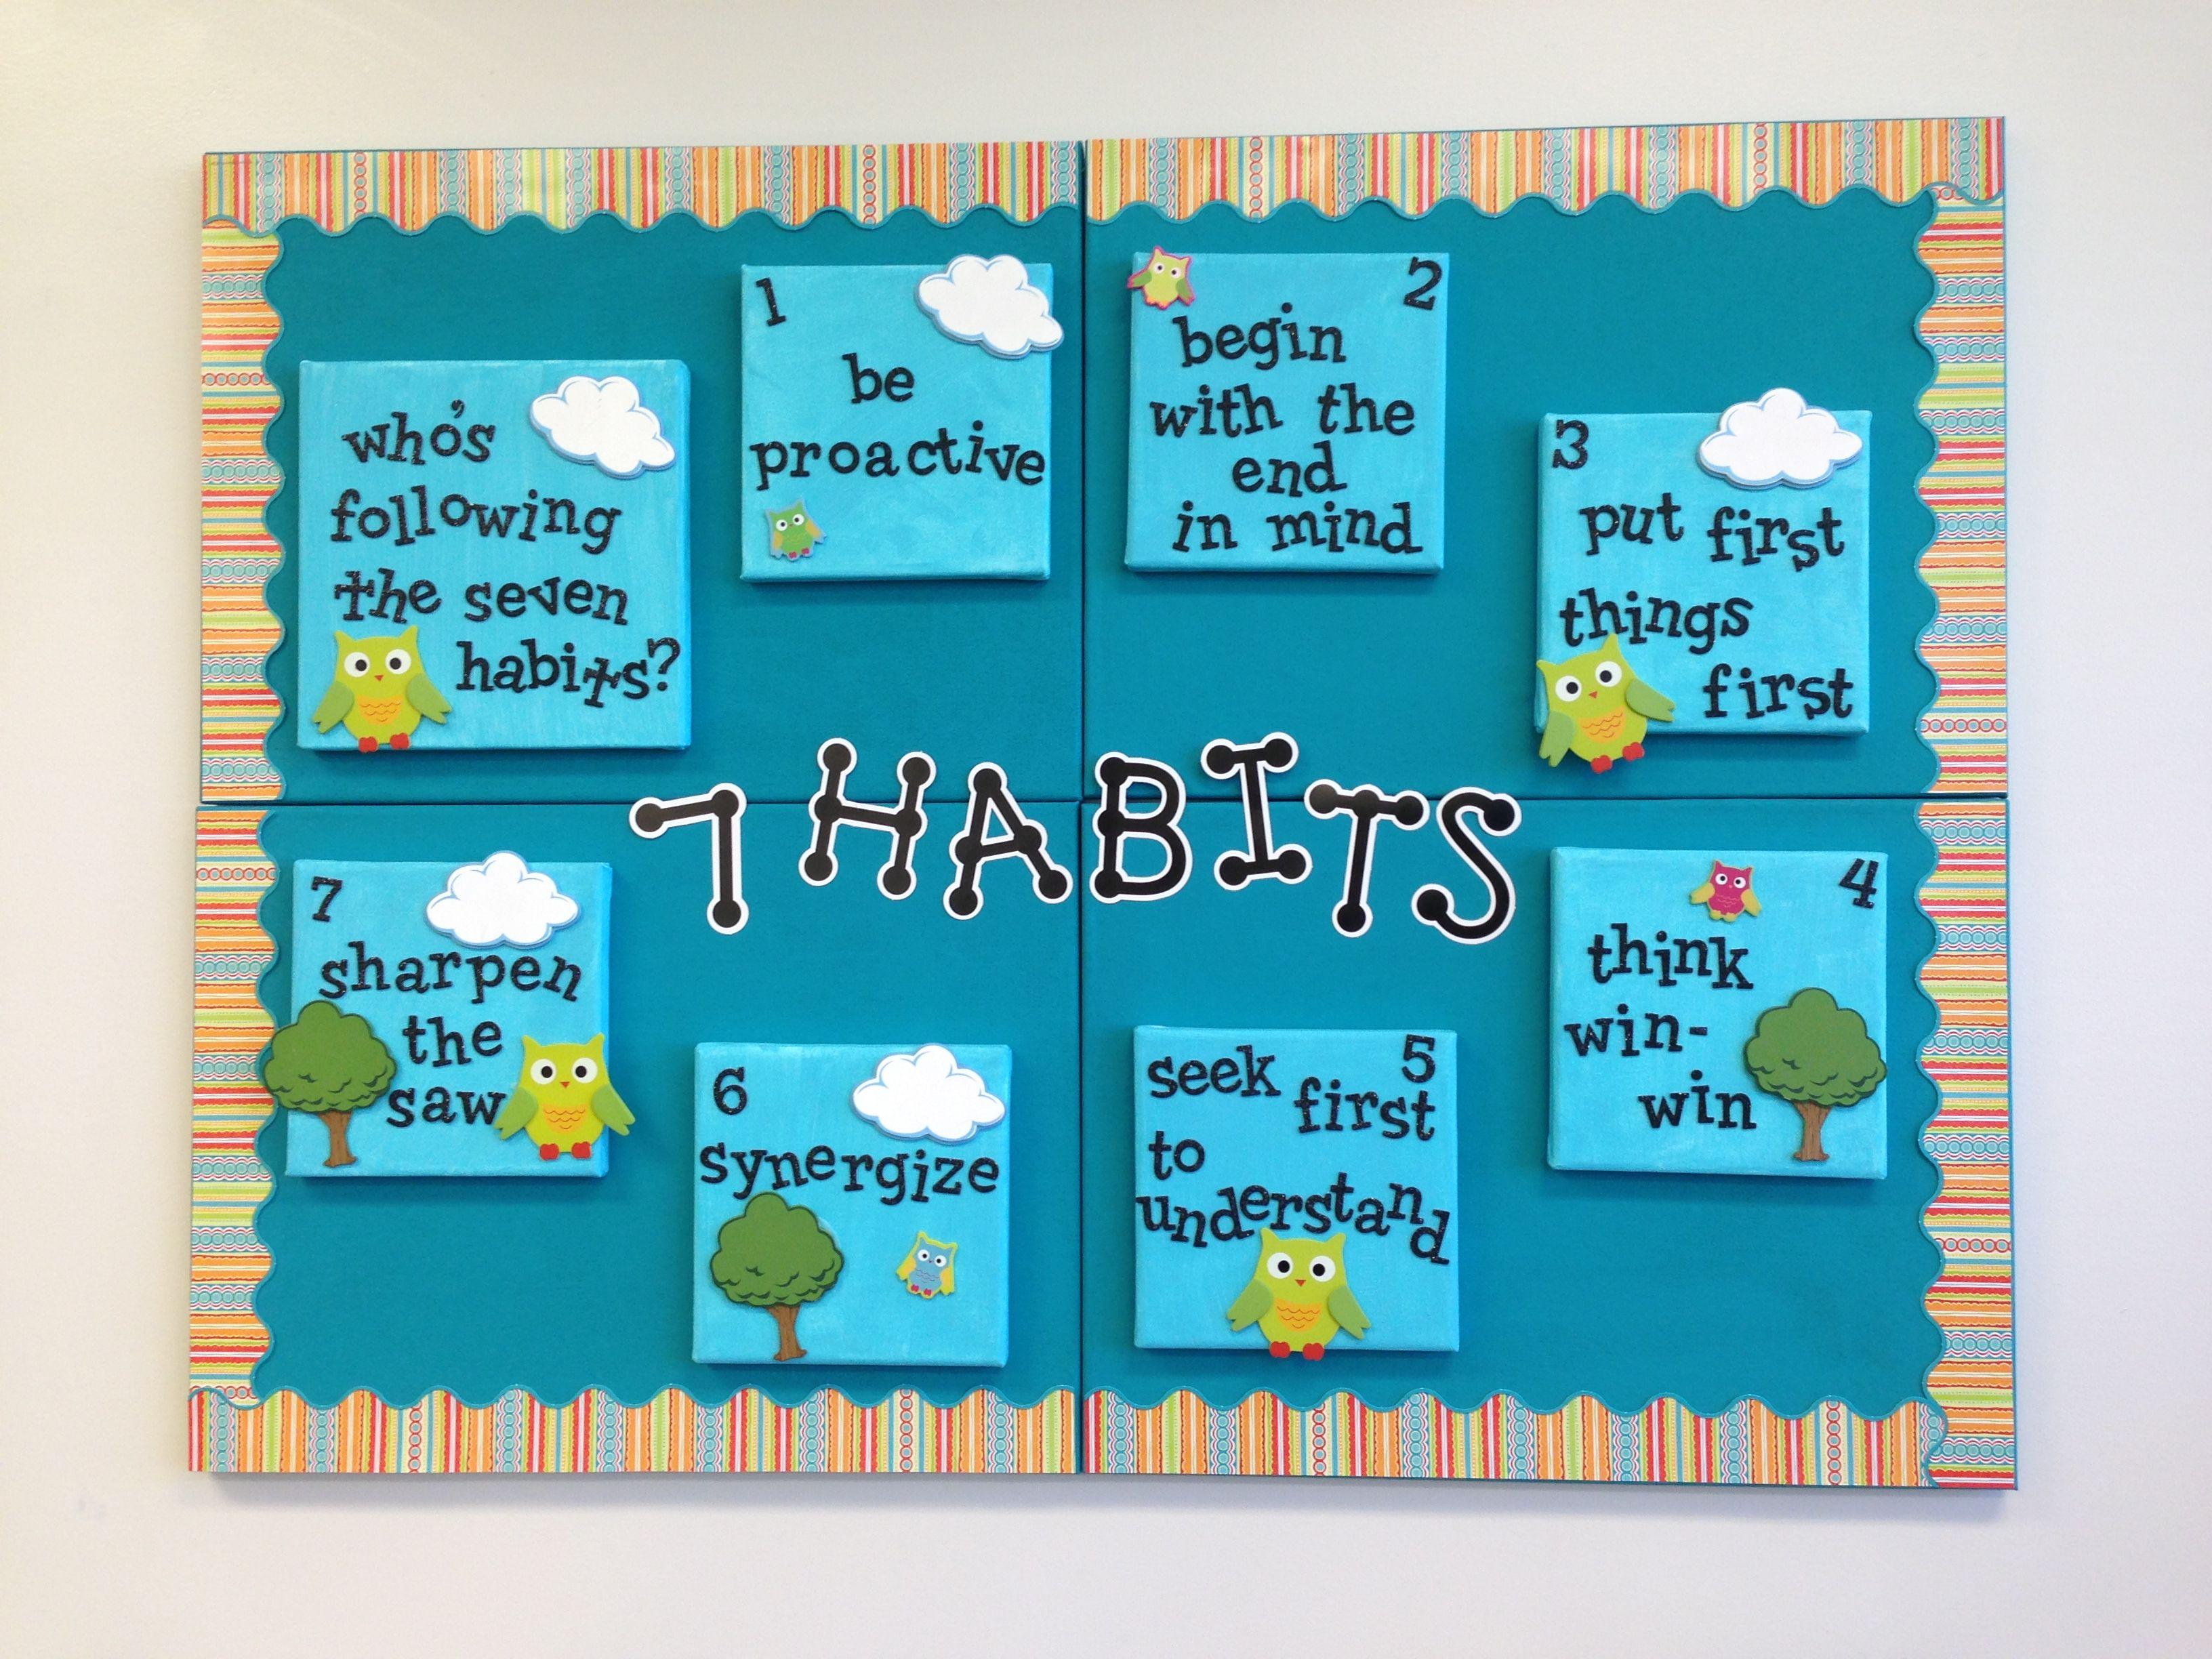 Seven habits display board classroom ideas pinterest for 7 habits decorations